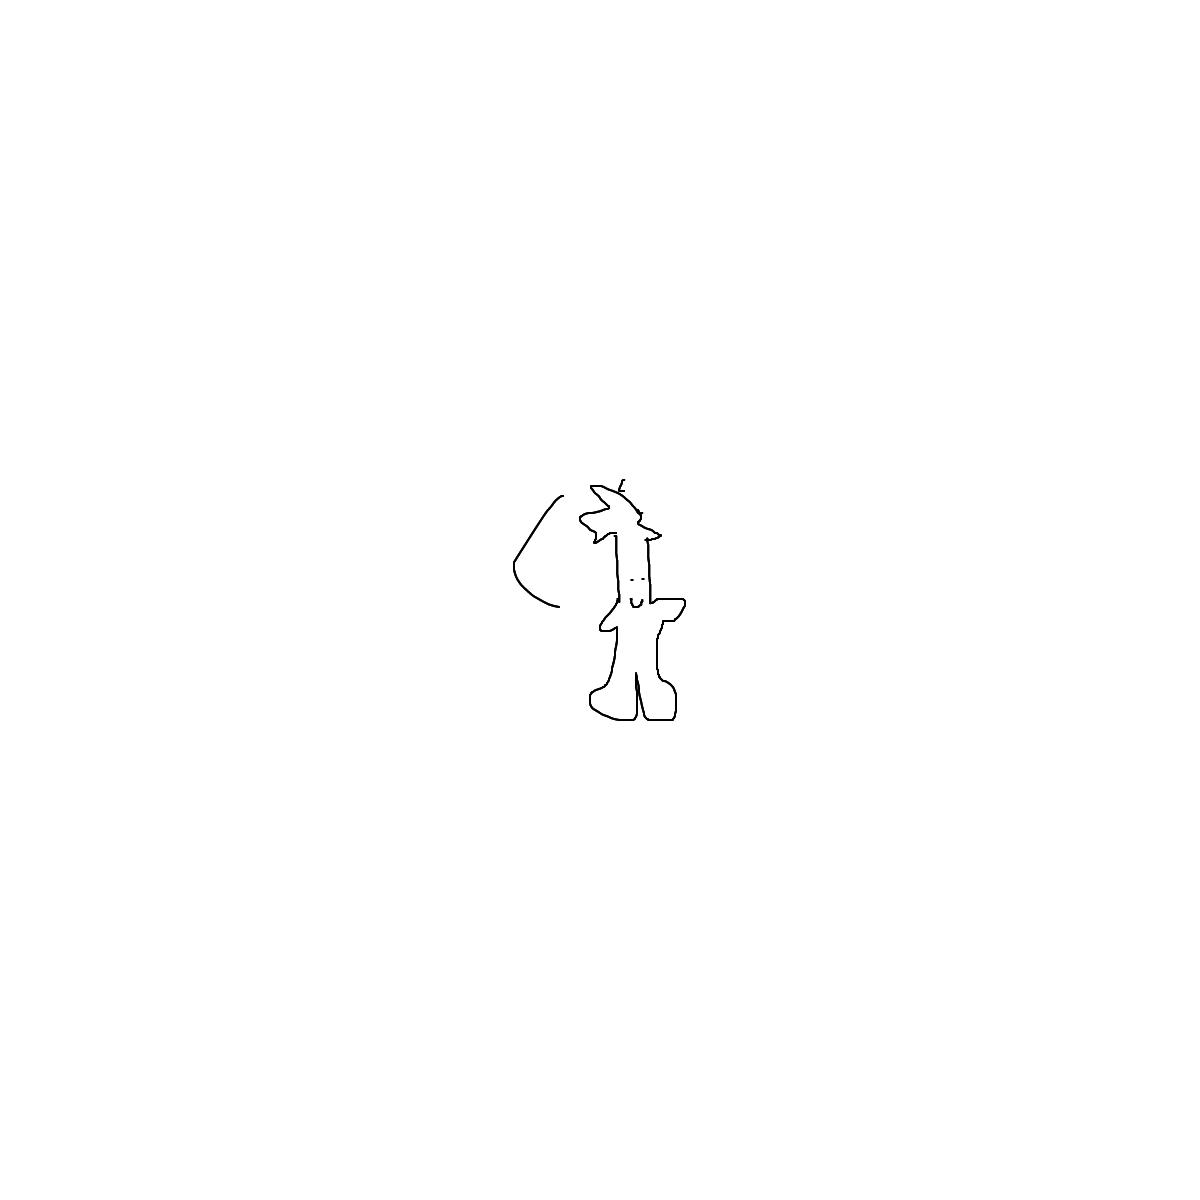 BAAAM drawing#1682 lat:52.3151969909668000lng: -1.4858993291854858